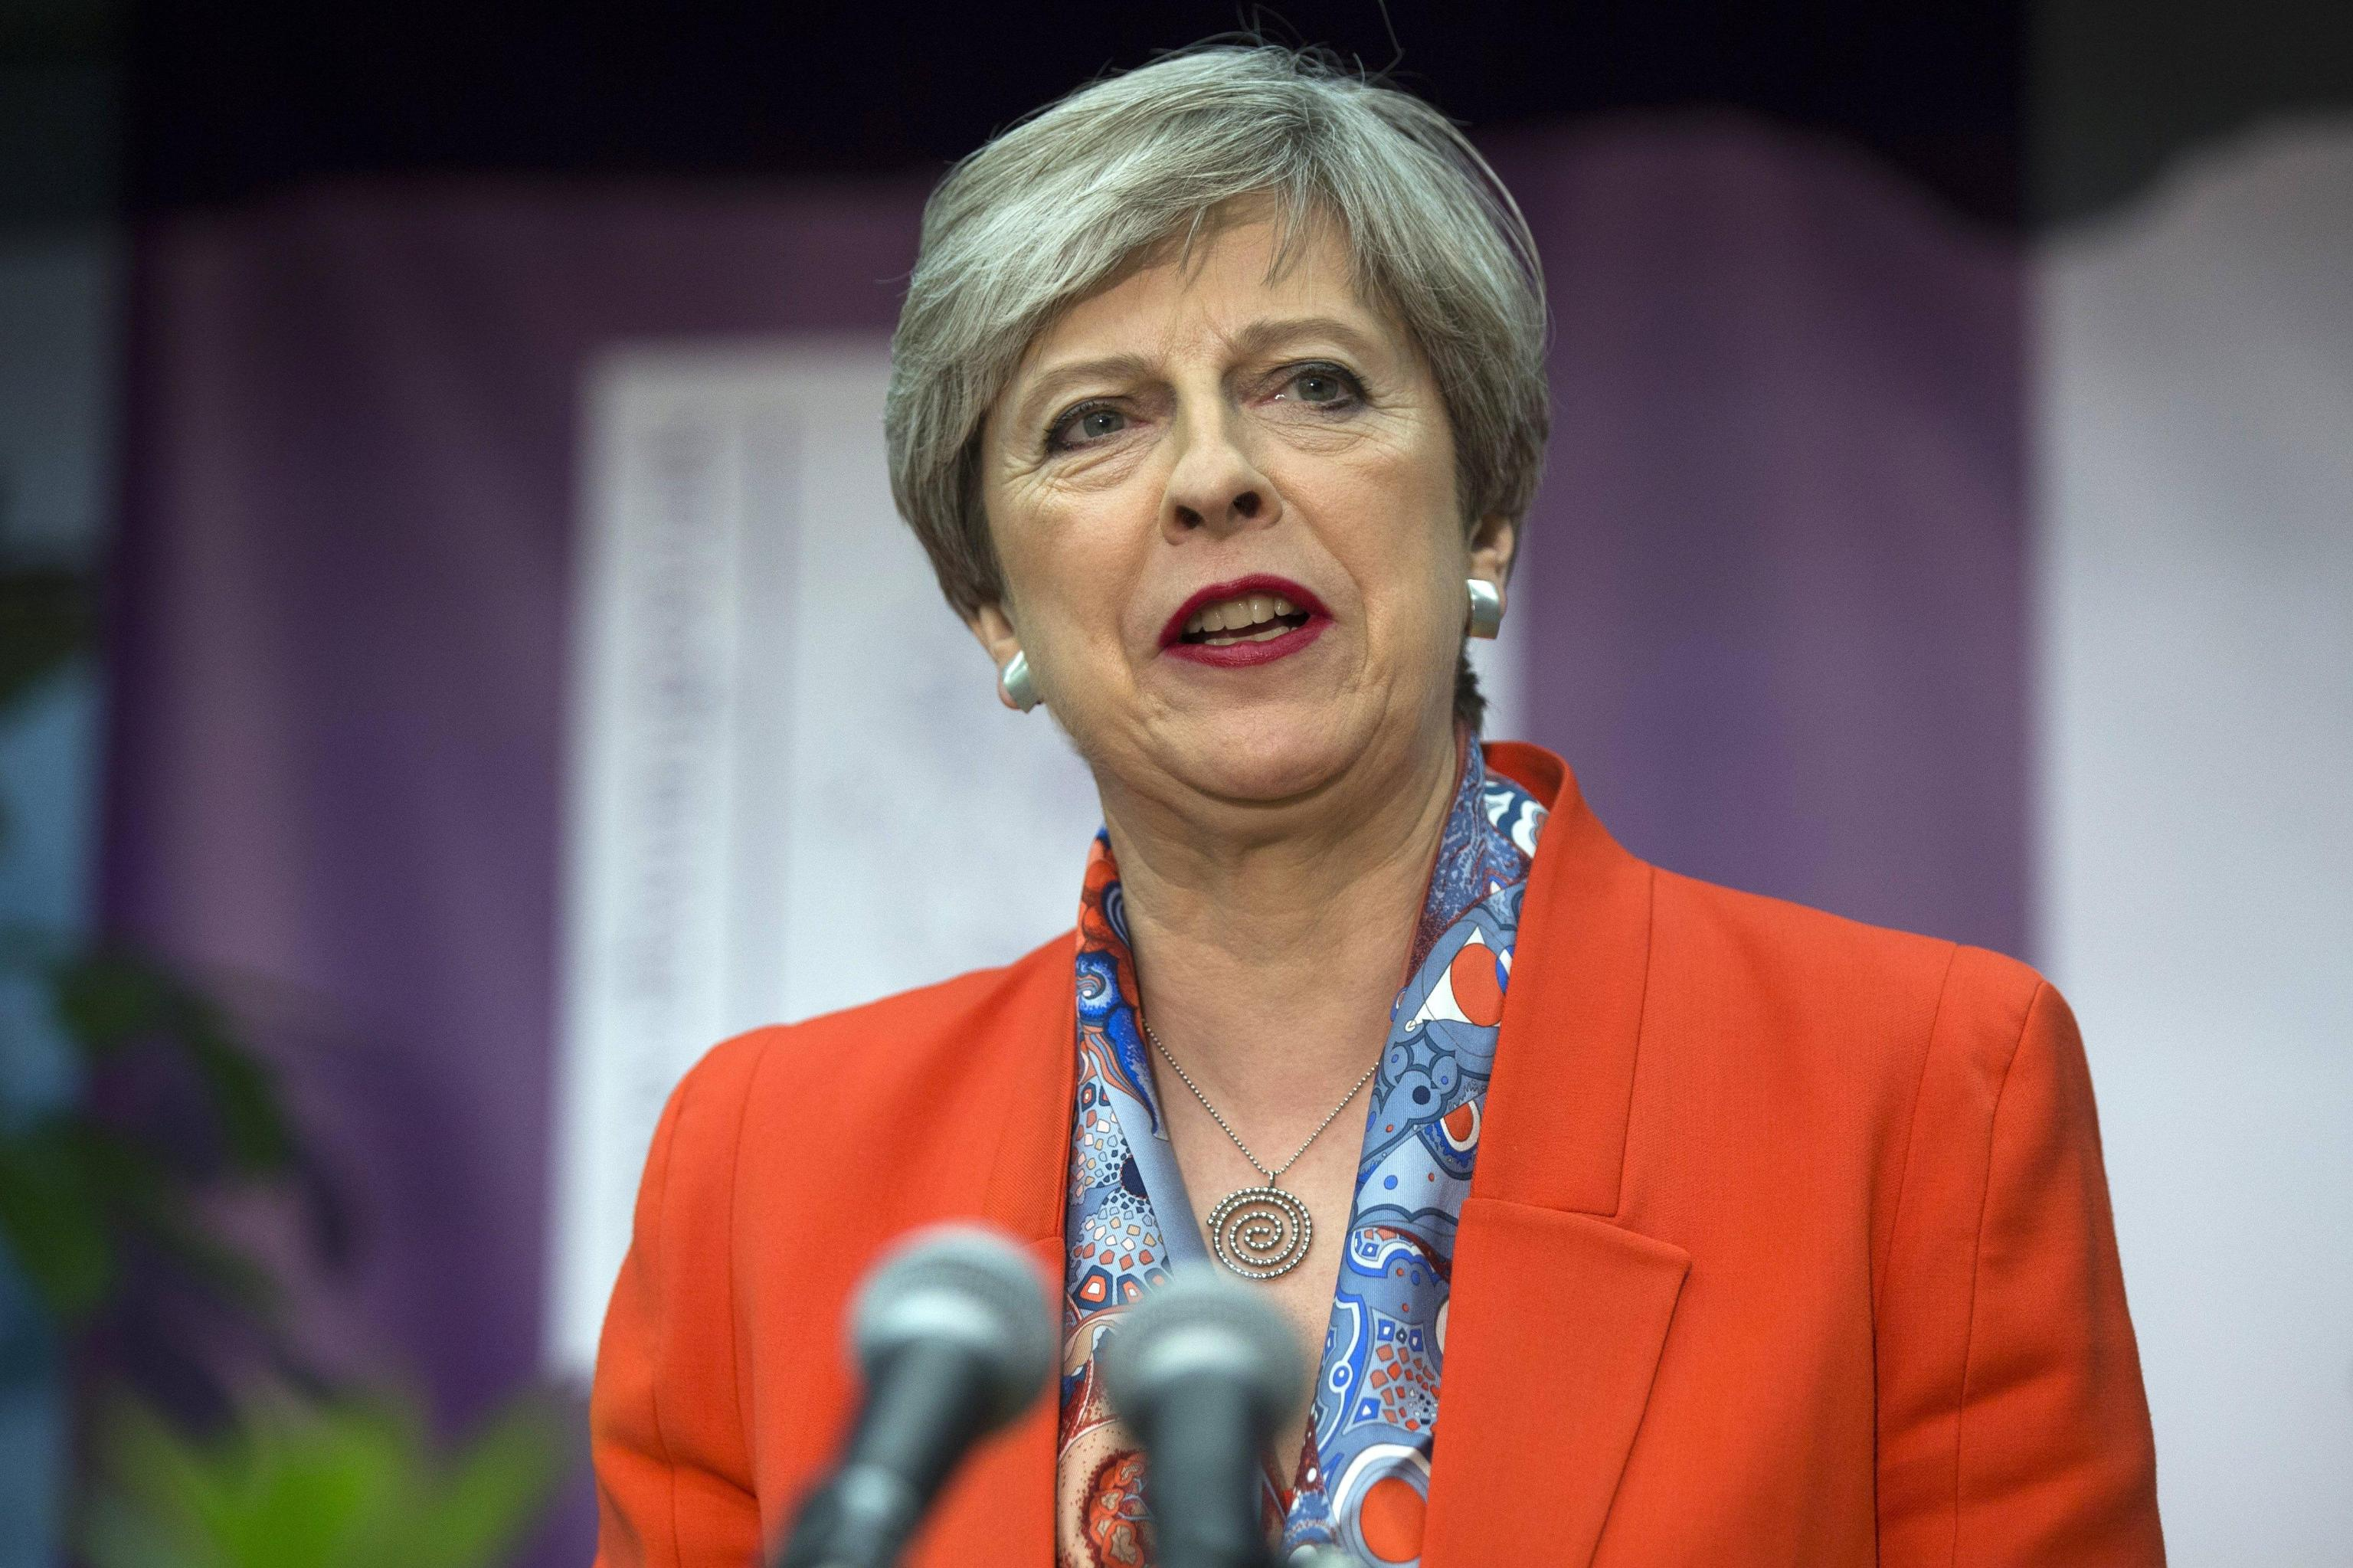 British General election